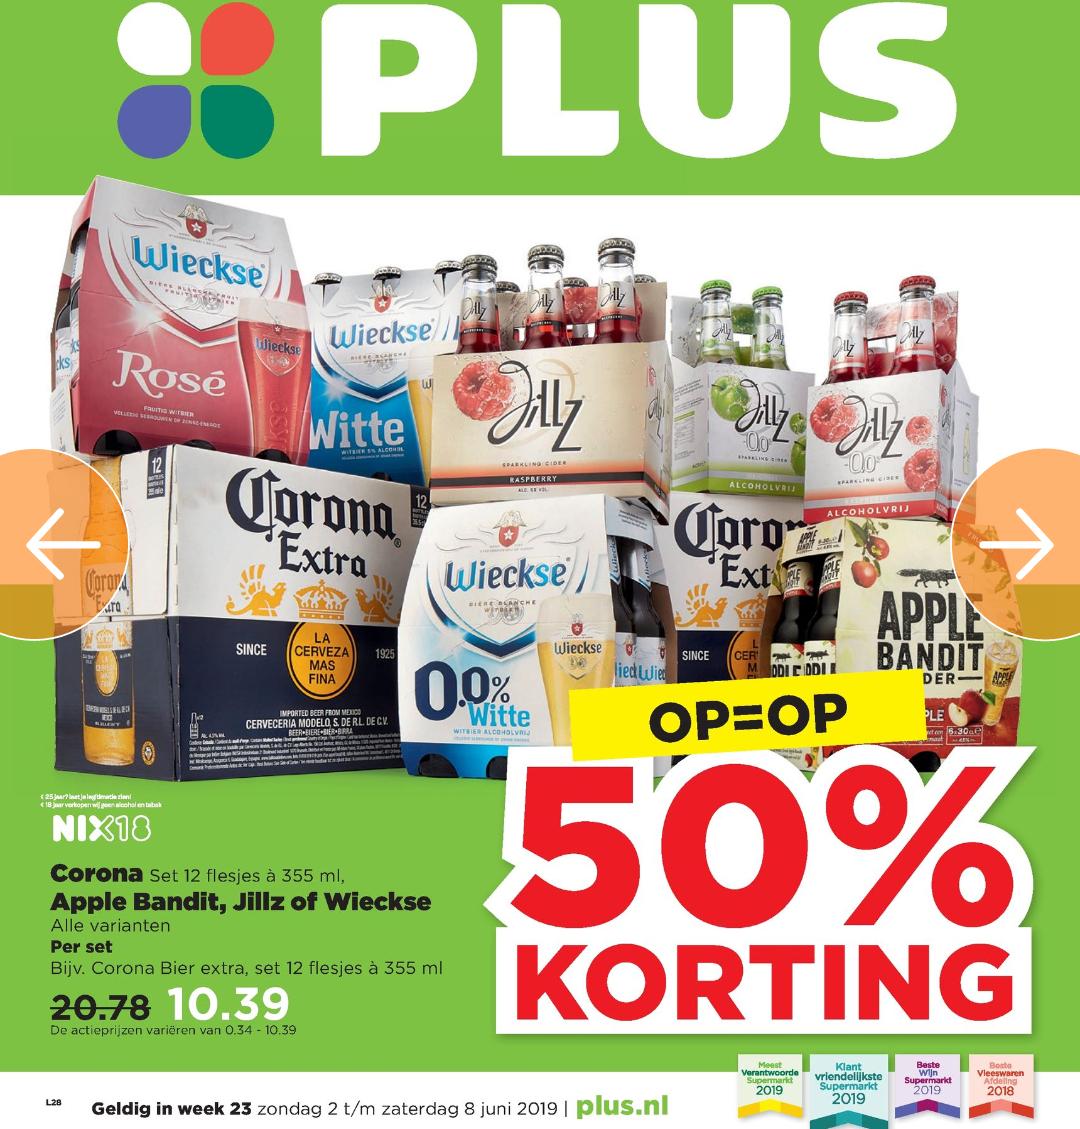 50% korting op Corona, Wieckse, Jillz & Apple Bandit @Plus